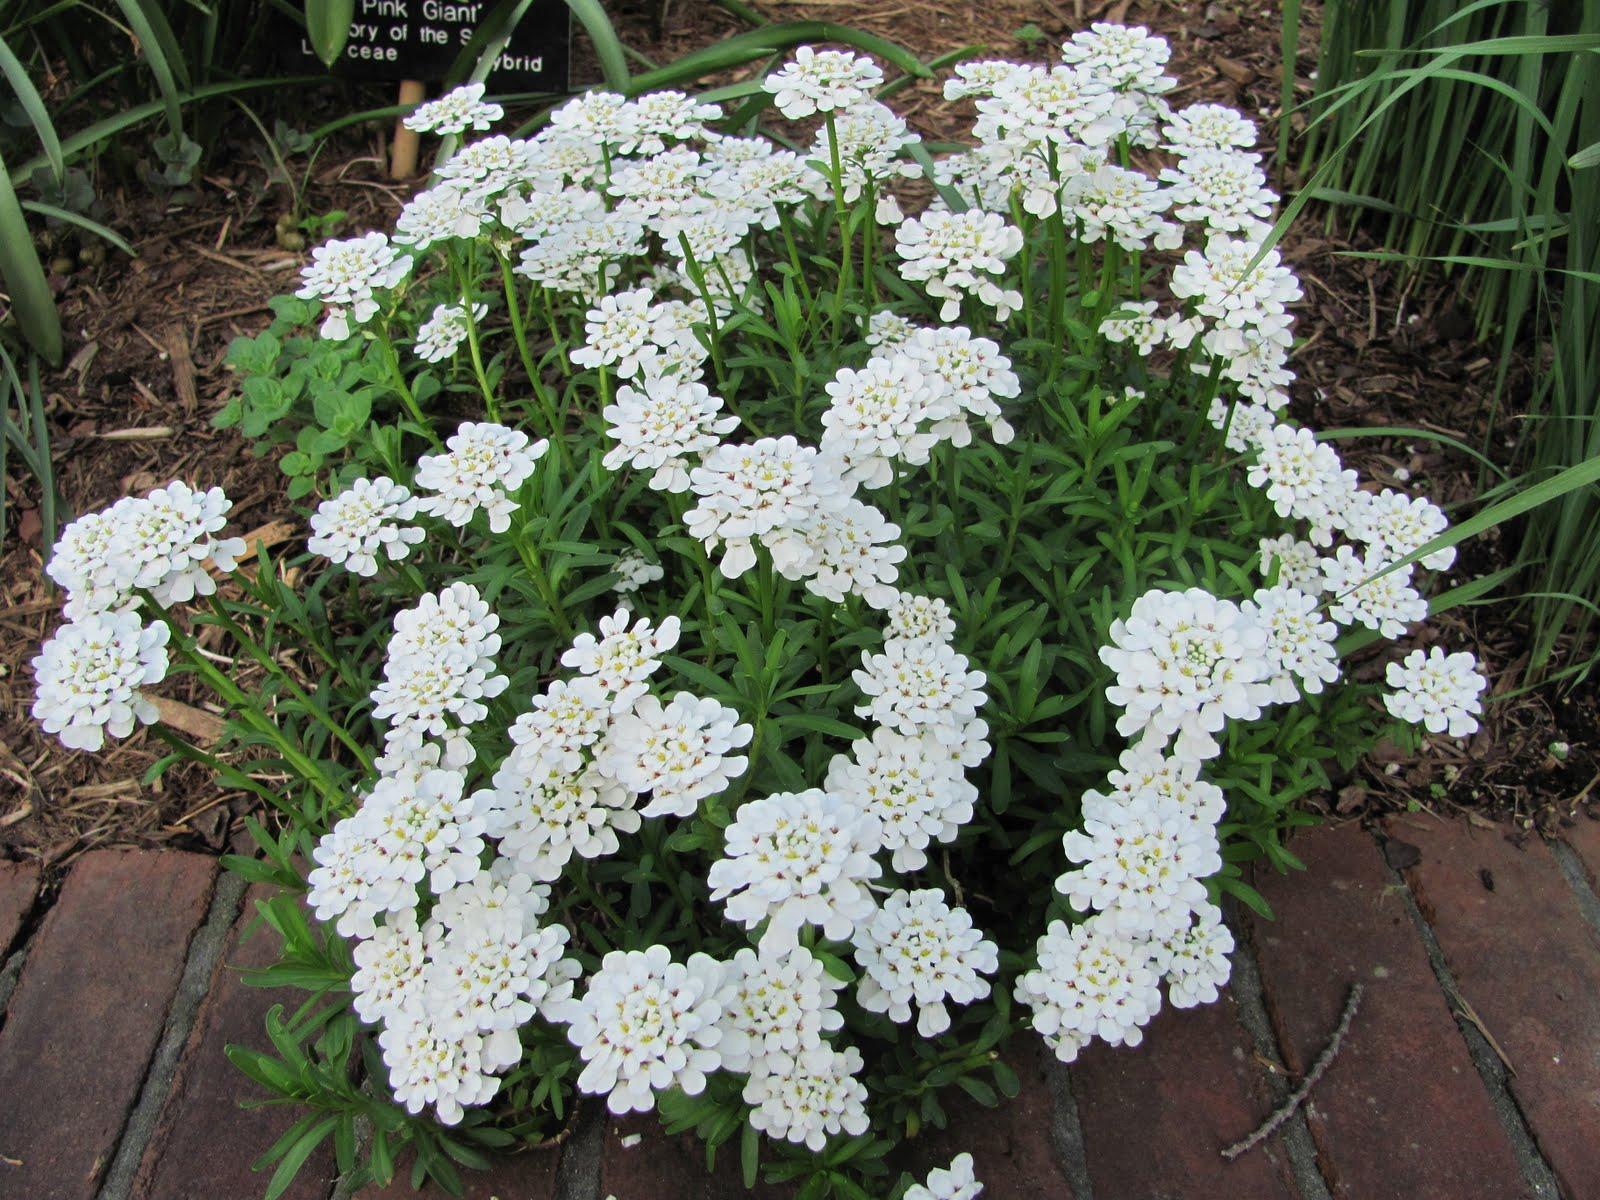 Planted cloud iberis sempervirens for Iberis sempervirens